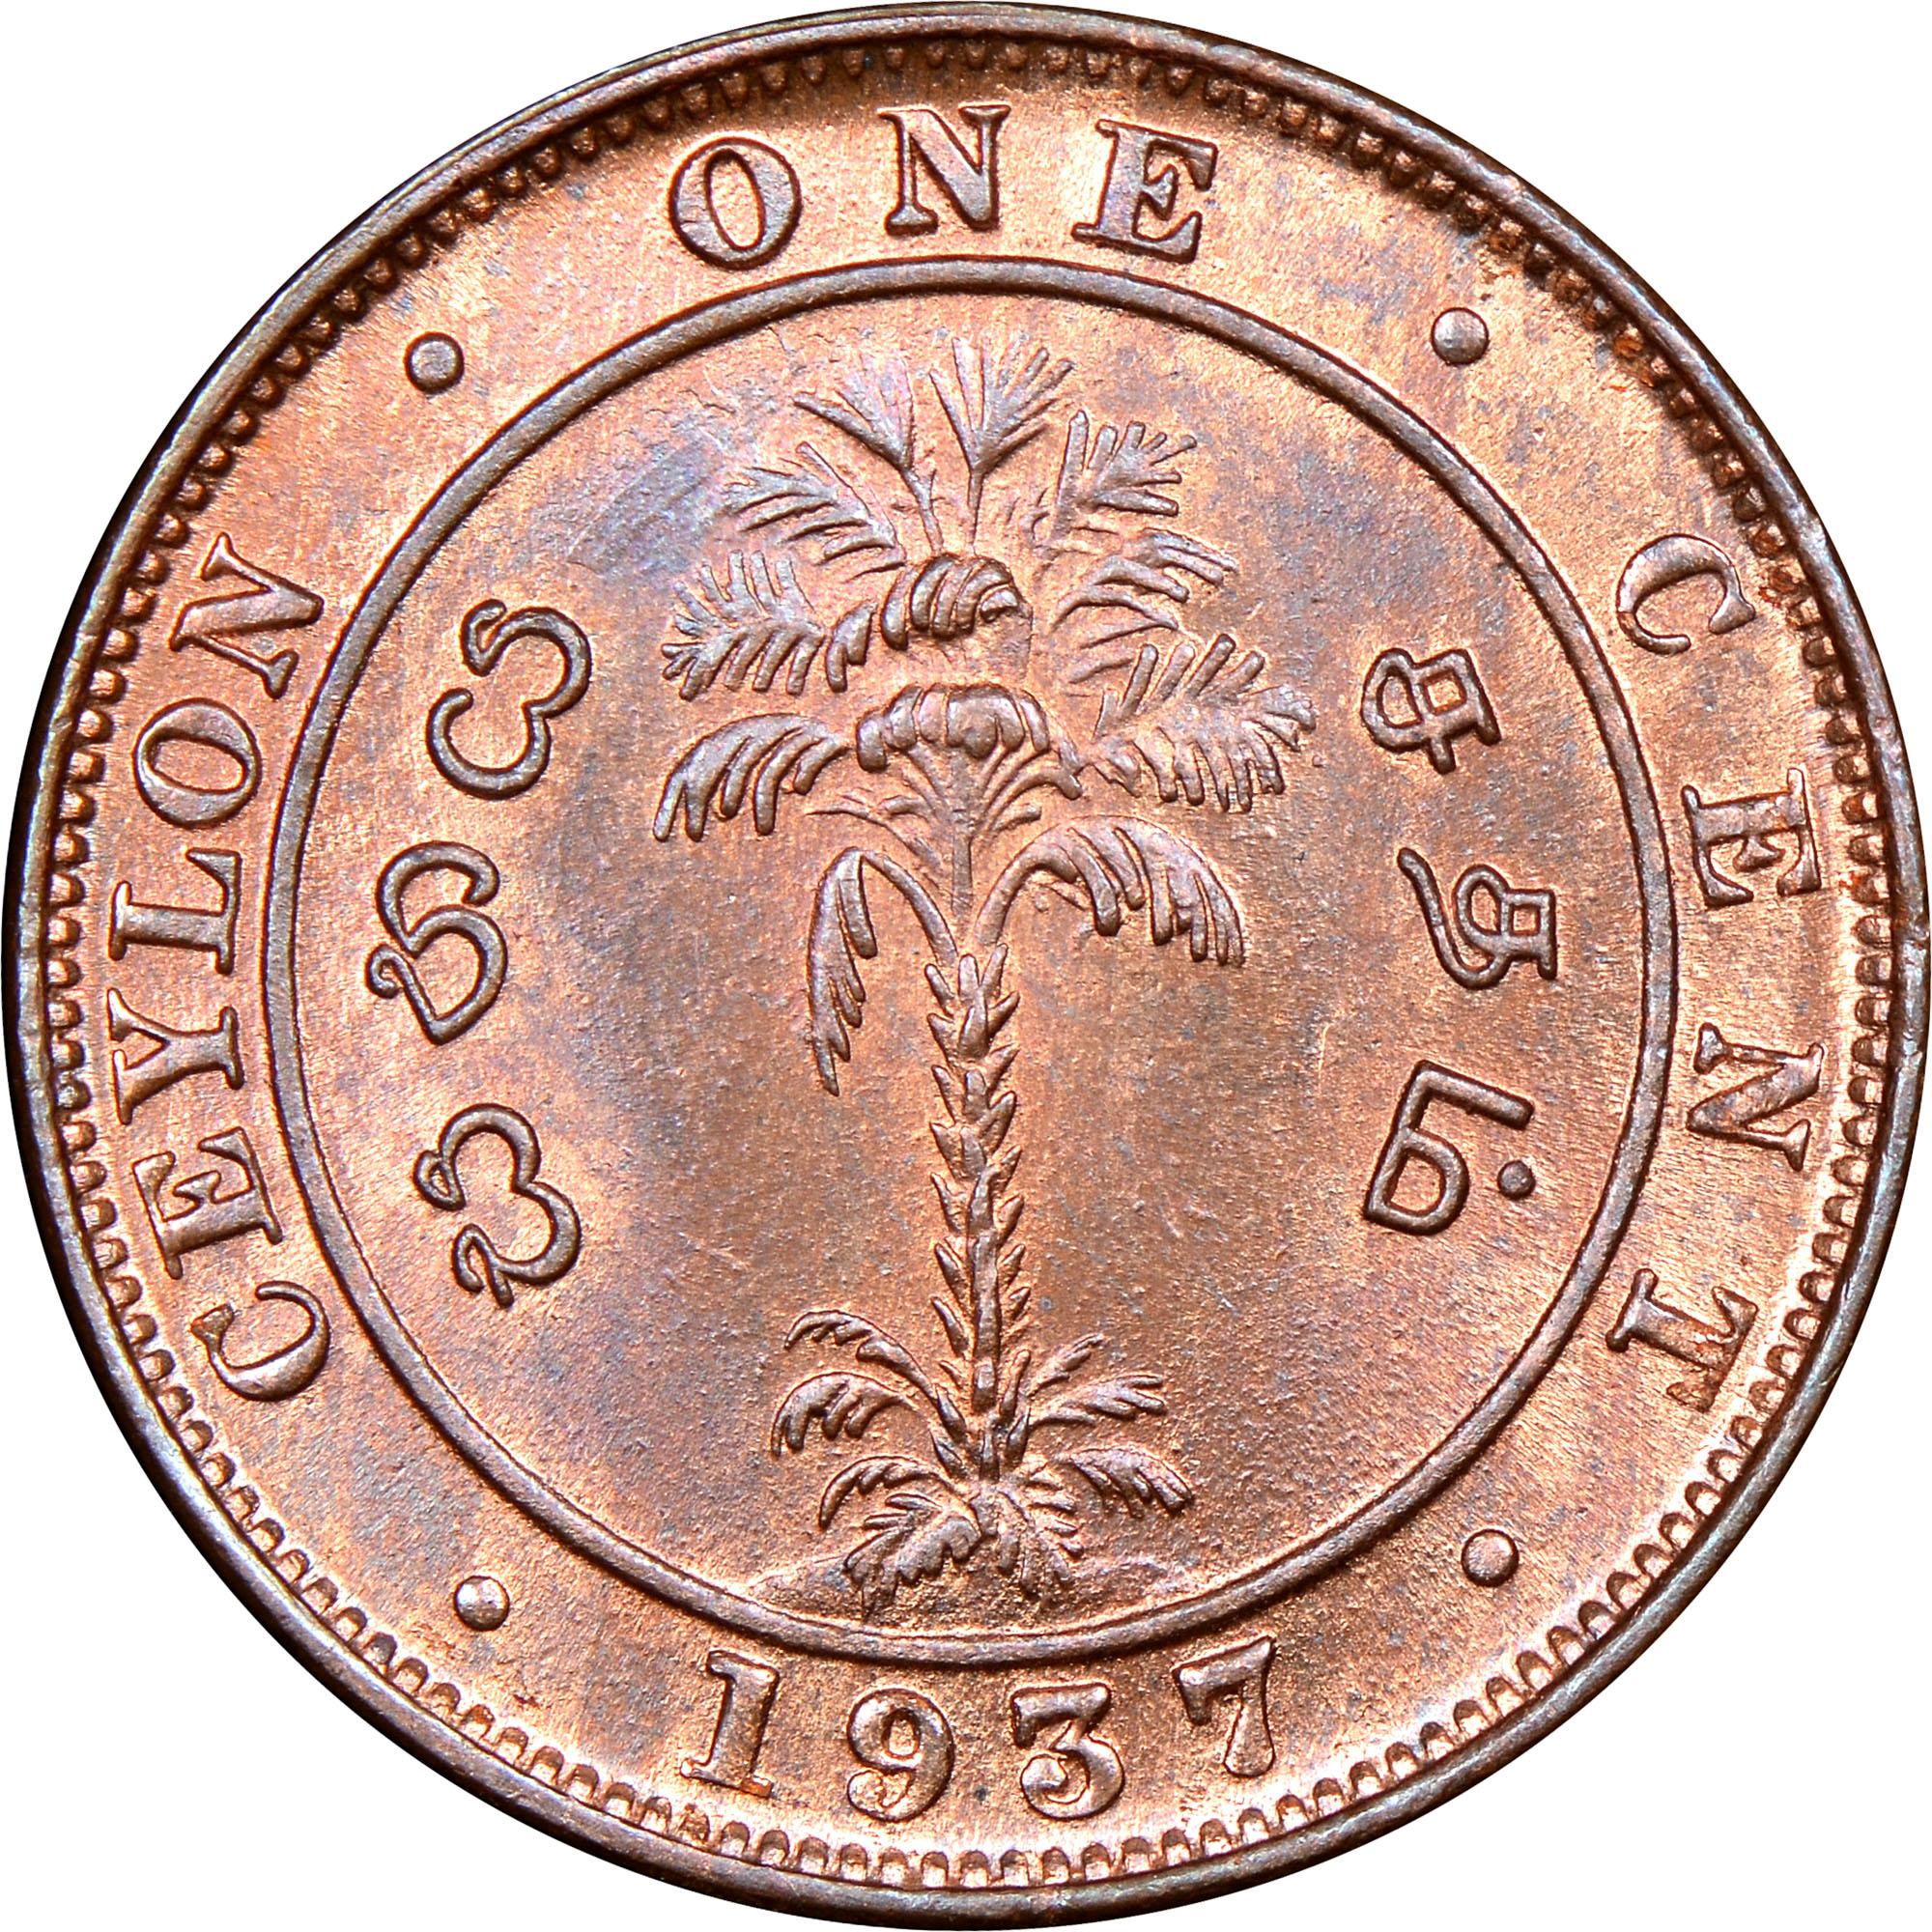 1937-1942 Ceylon Cent reverse